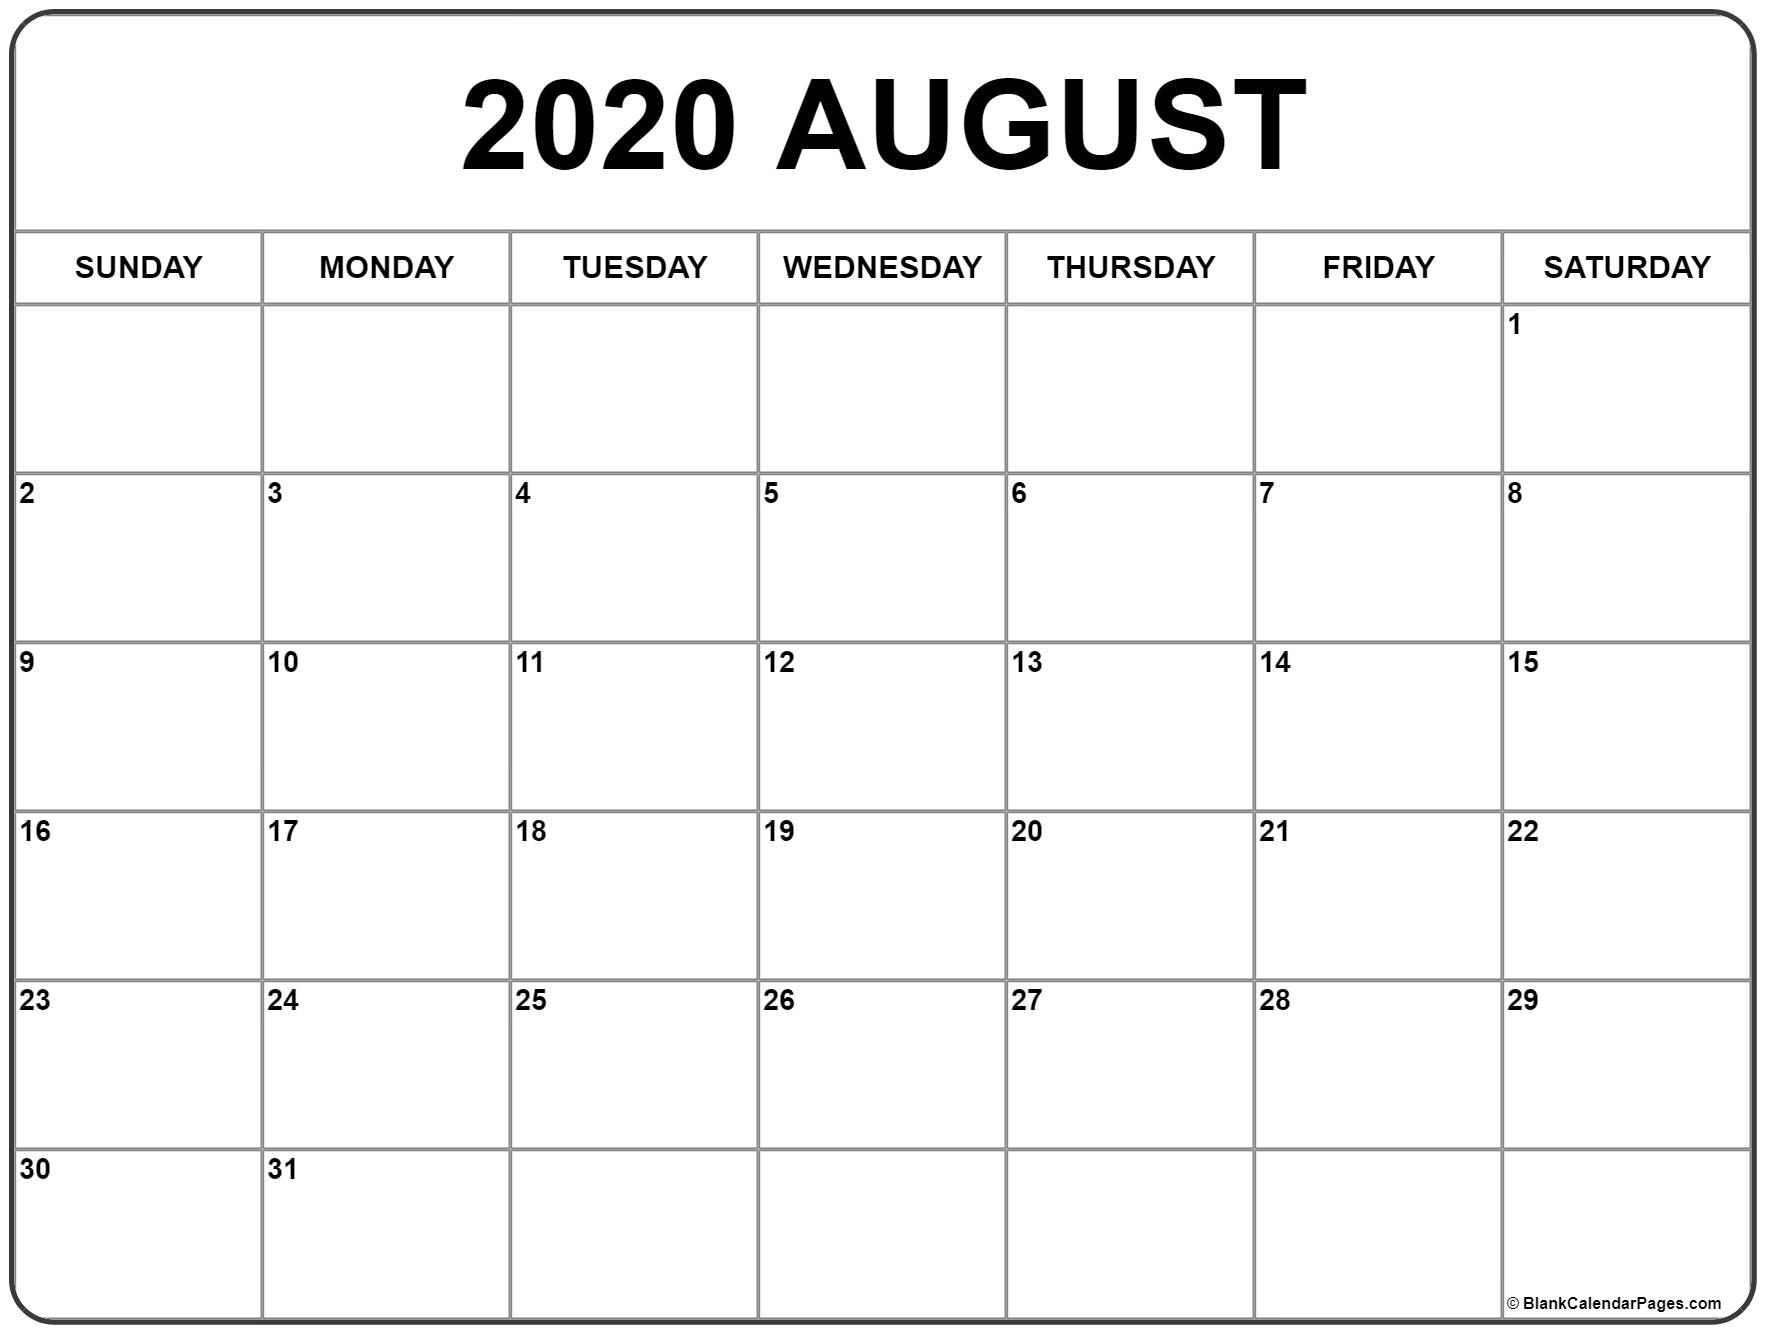 Aug 2020 Calander - Temusi